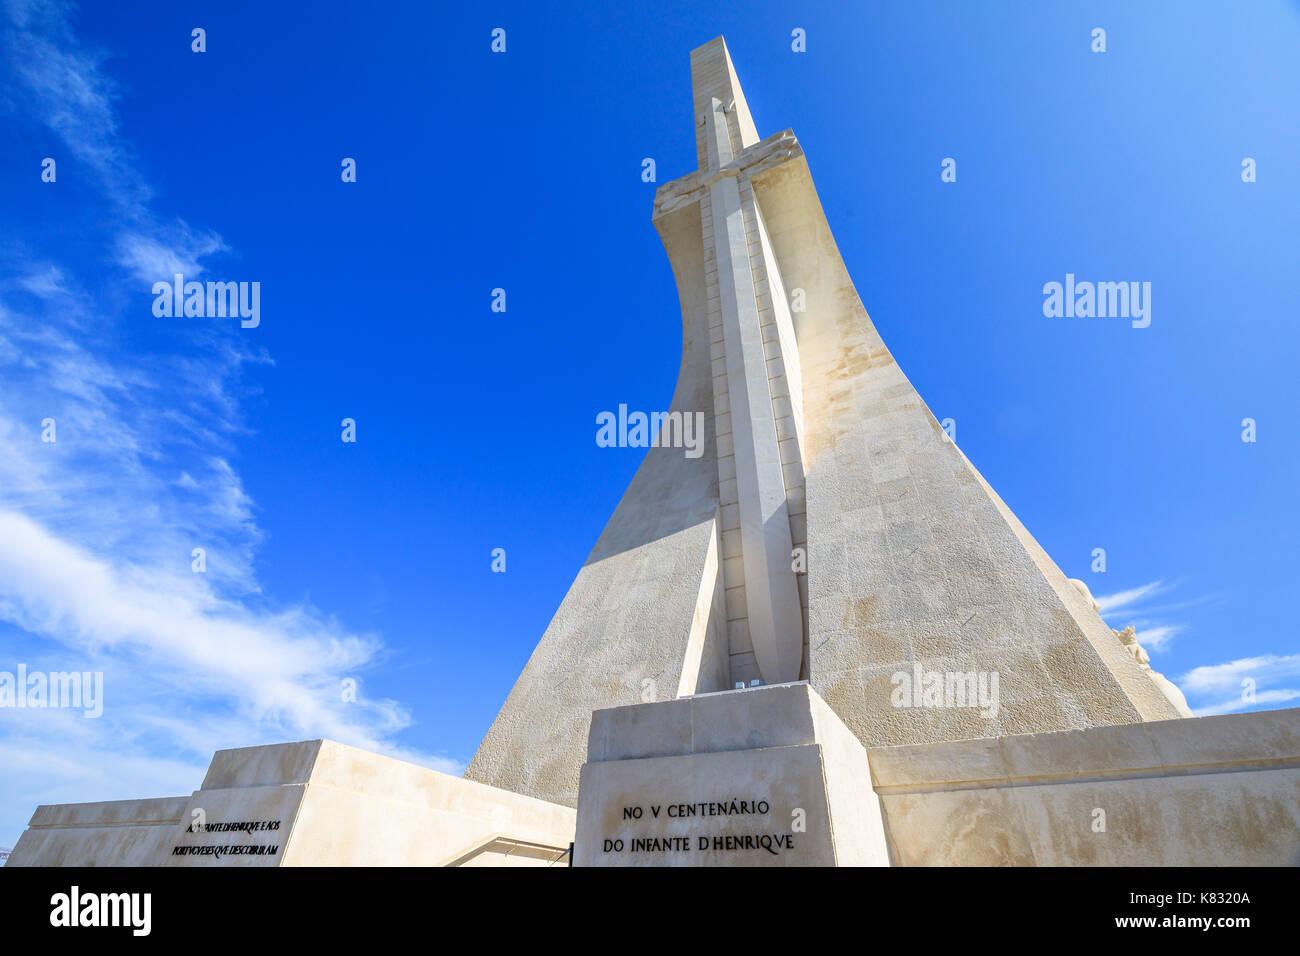 Discoveries Monument Lisbon - Stock Image